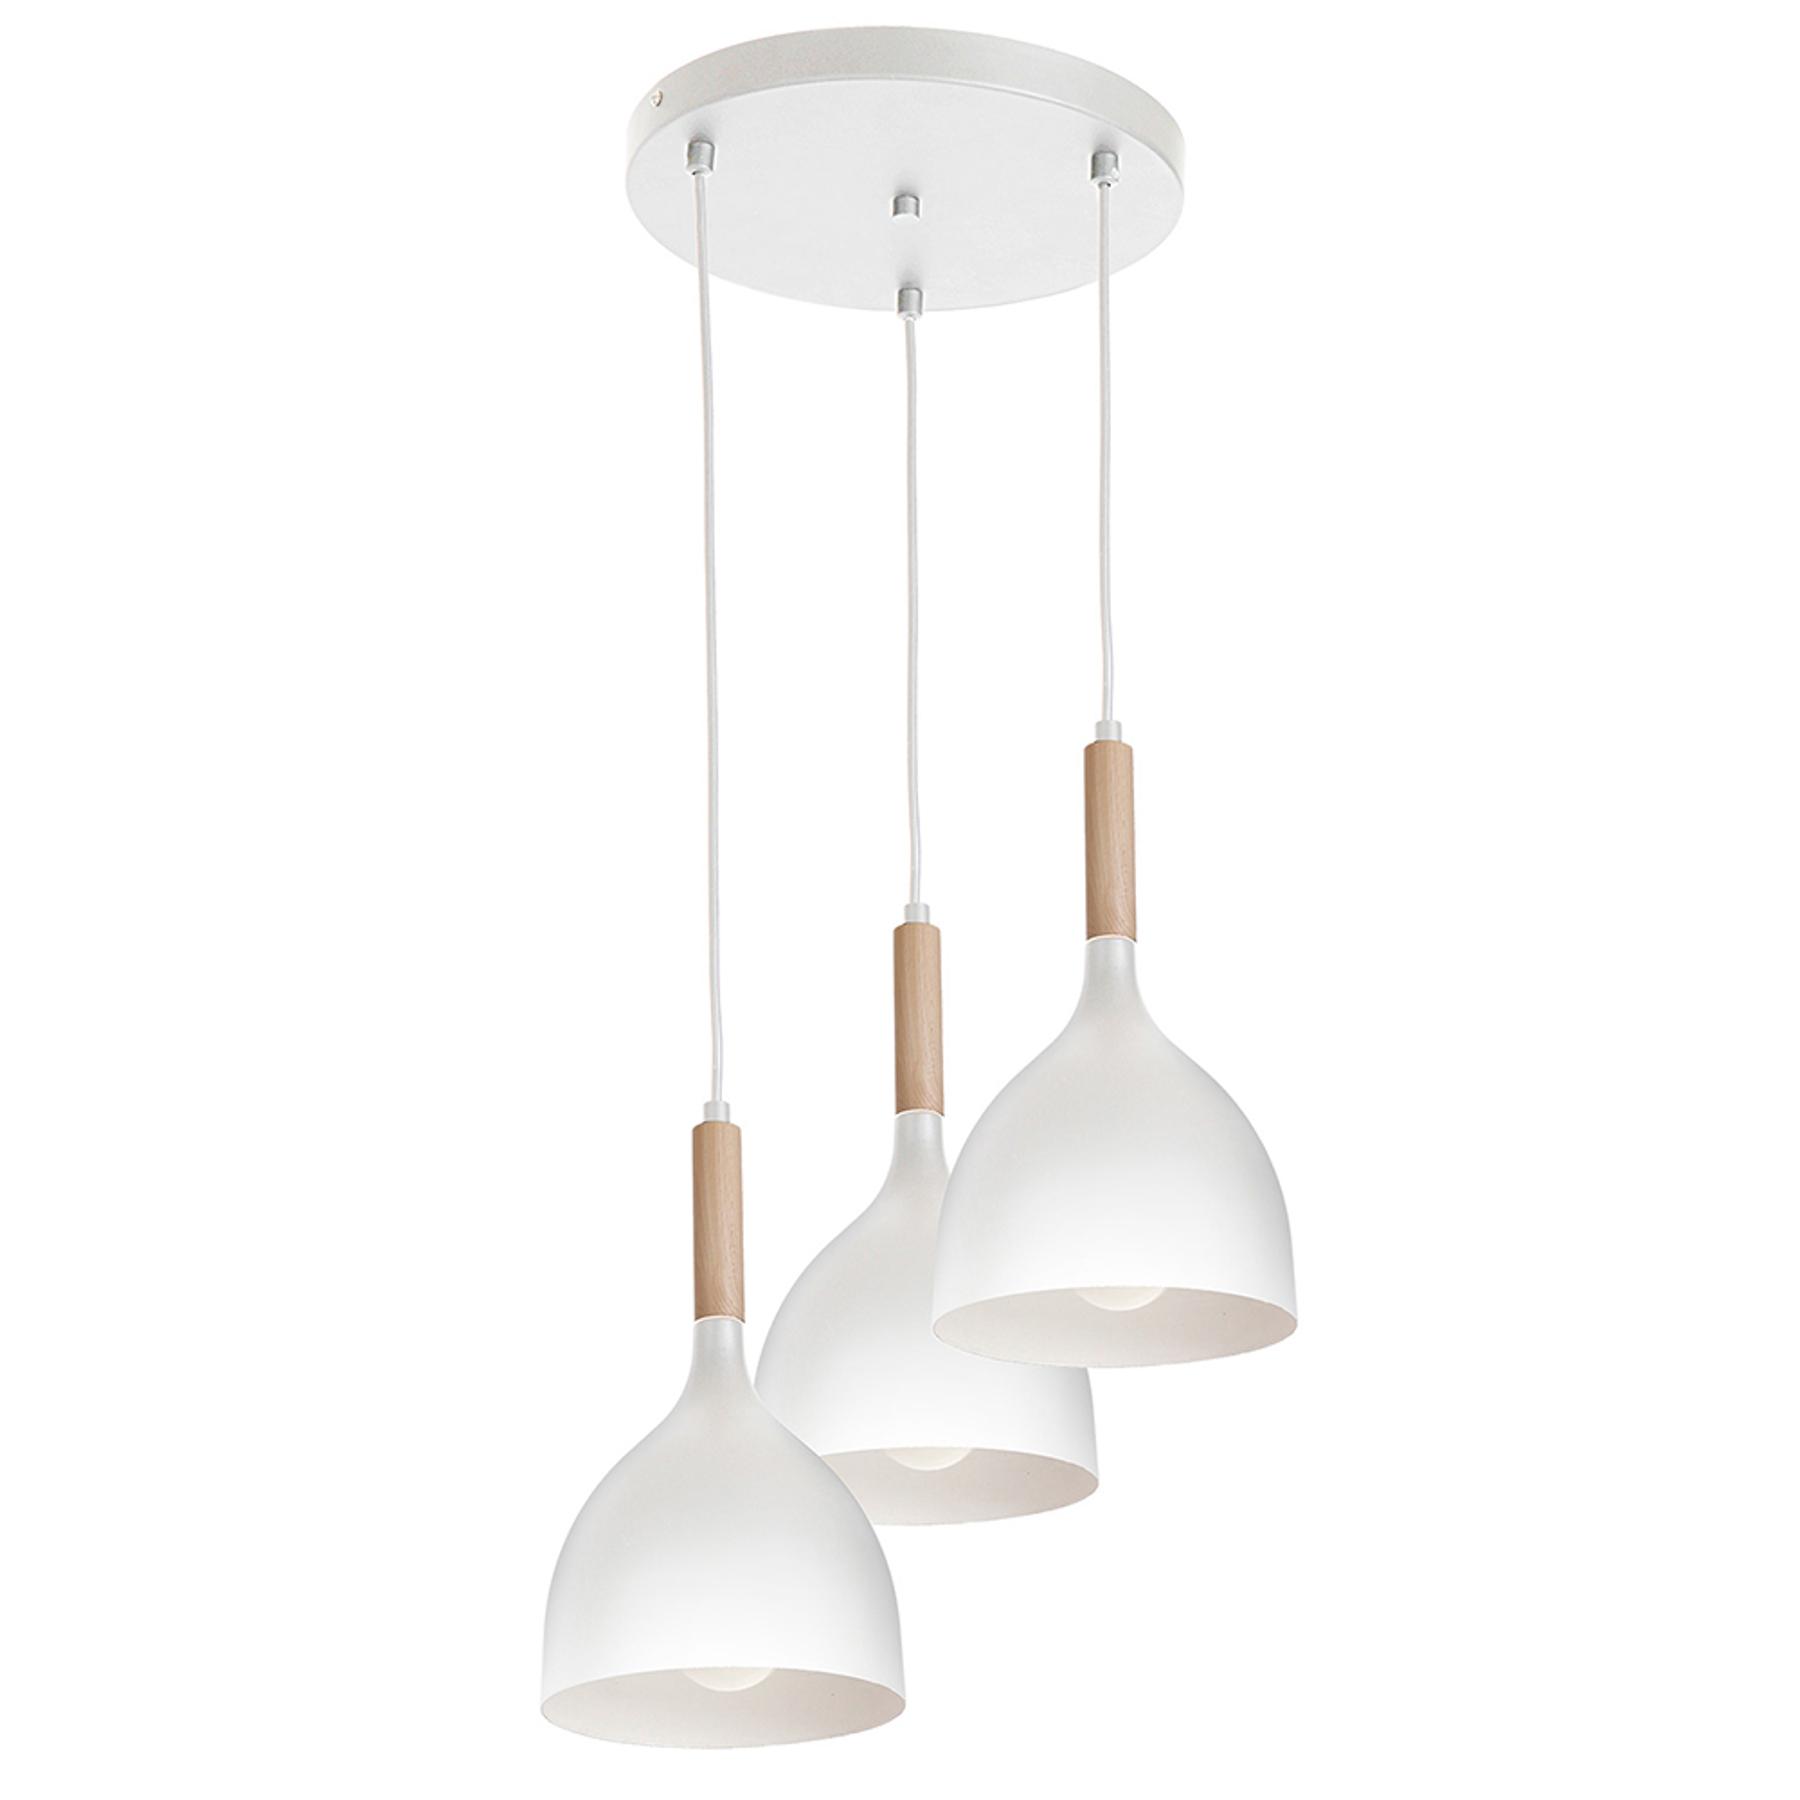 Hanglamp Noak 3-lamps rond wit/hout natuur